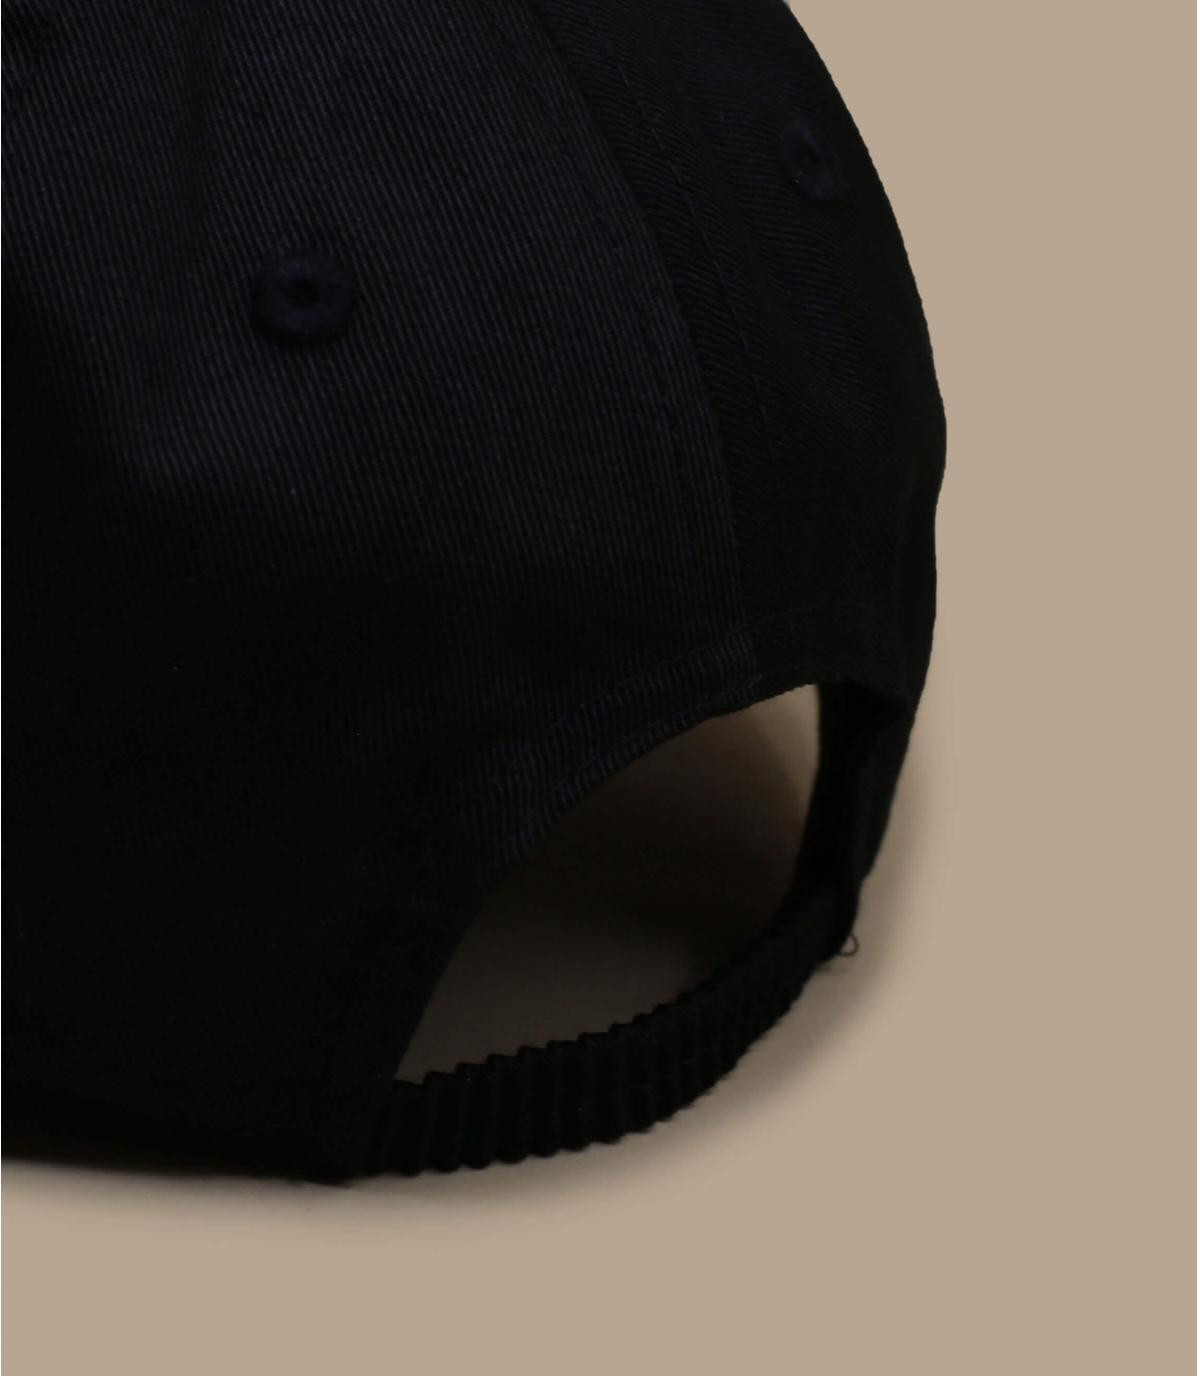 Details Baby Cap League Ess 940 LA black toffee - Abbildung 3